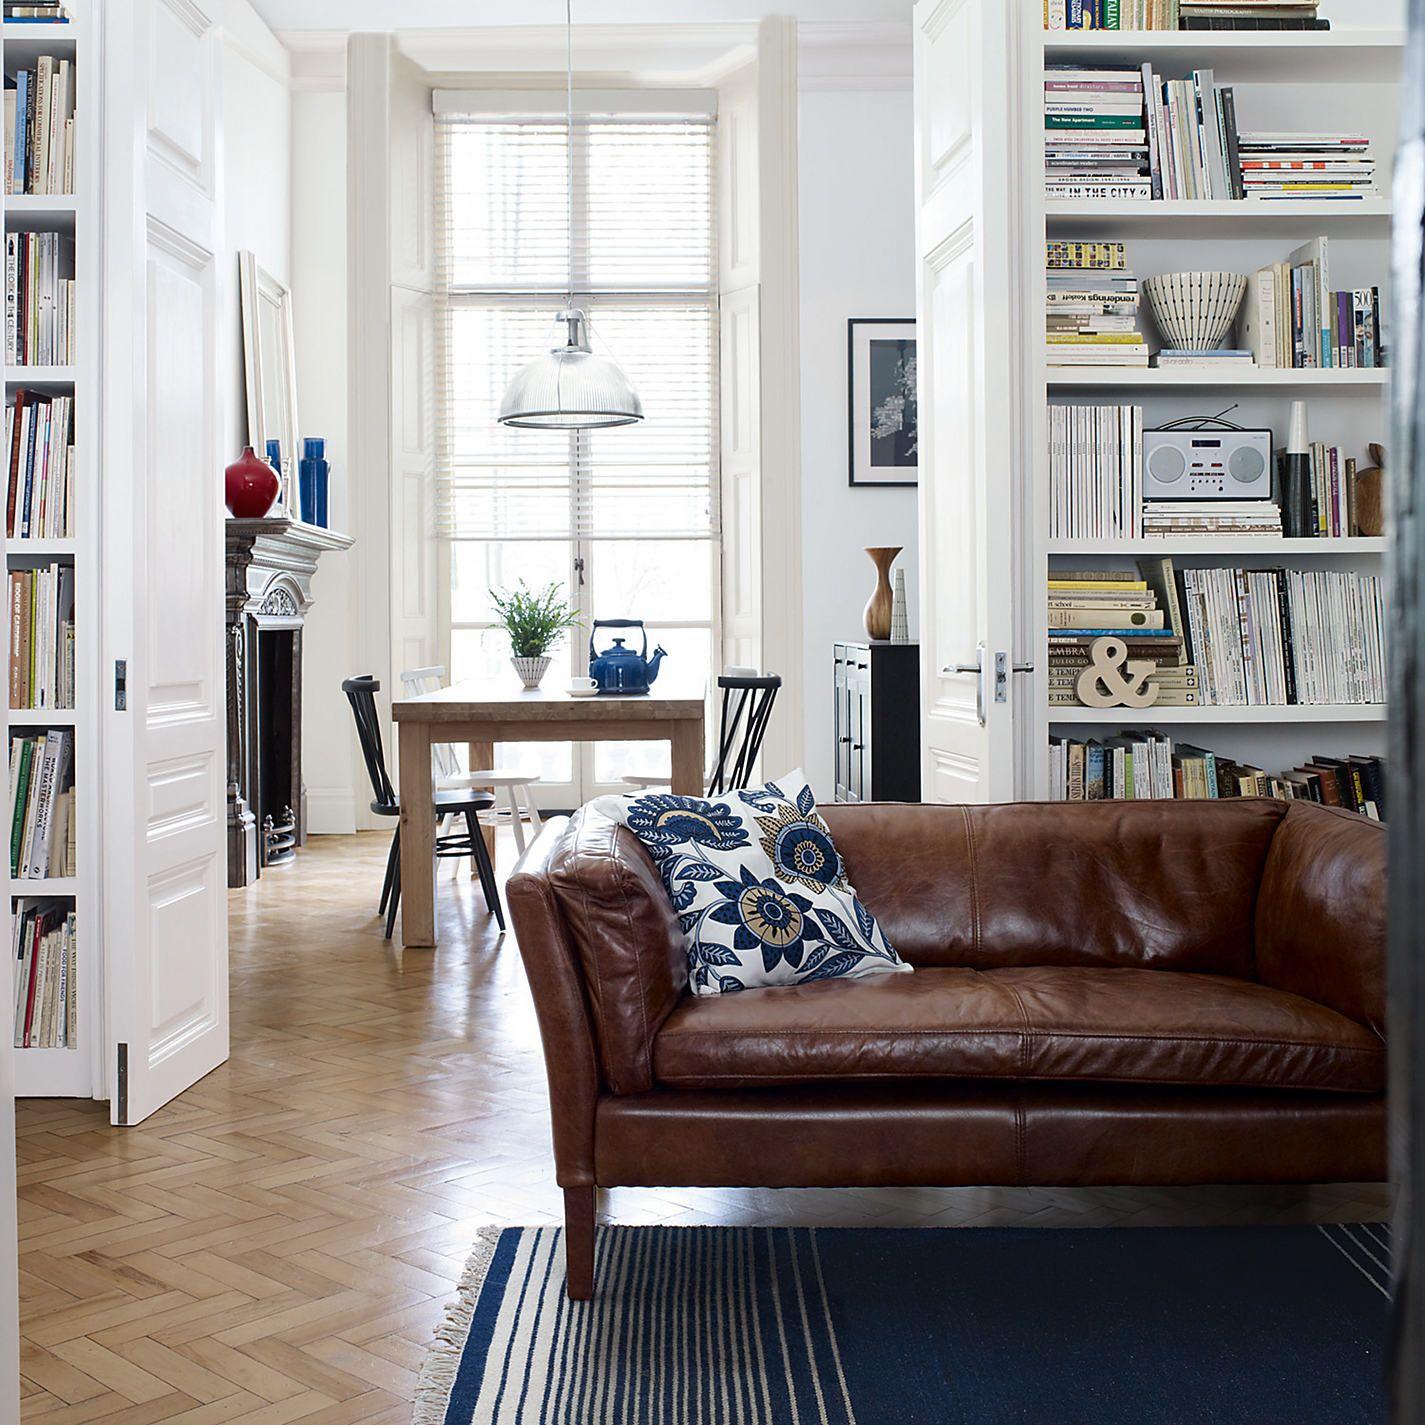 Living Room Furniture John Lewis gaucho halo sofa - google search | dark sofas | pinterest | dark